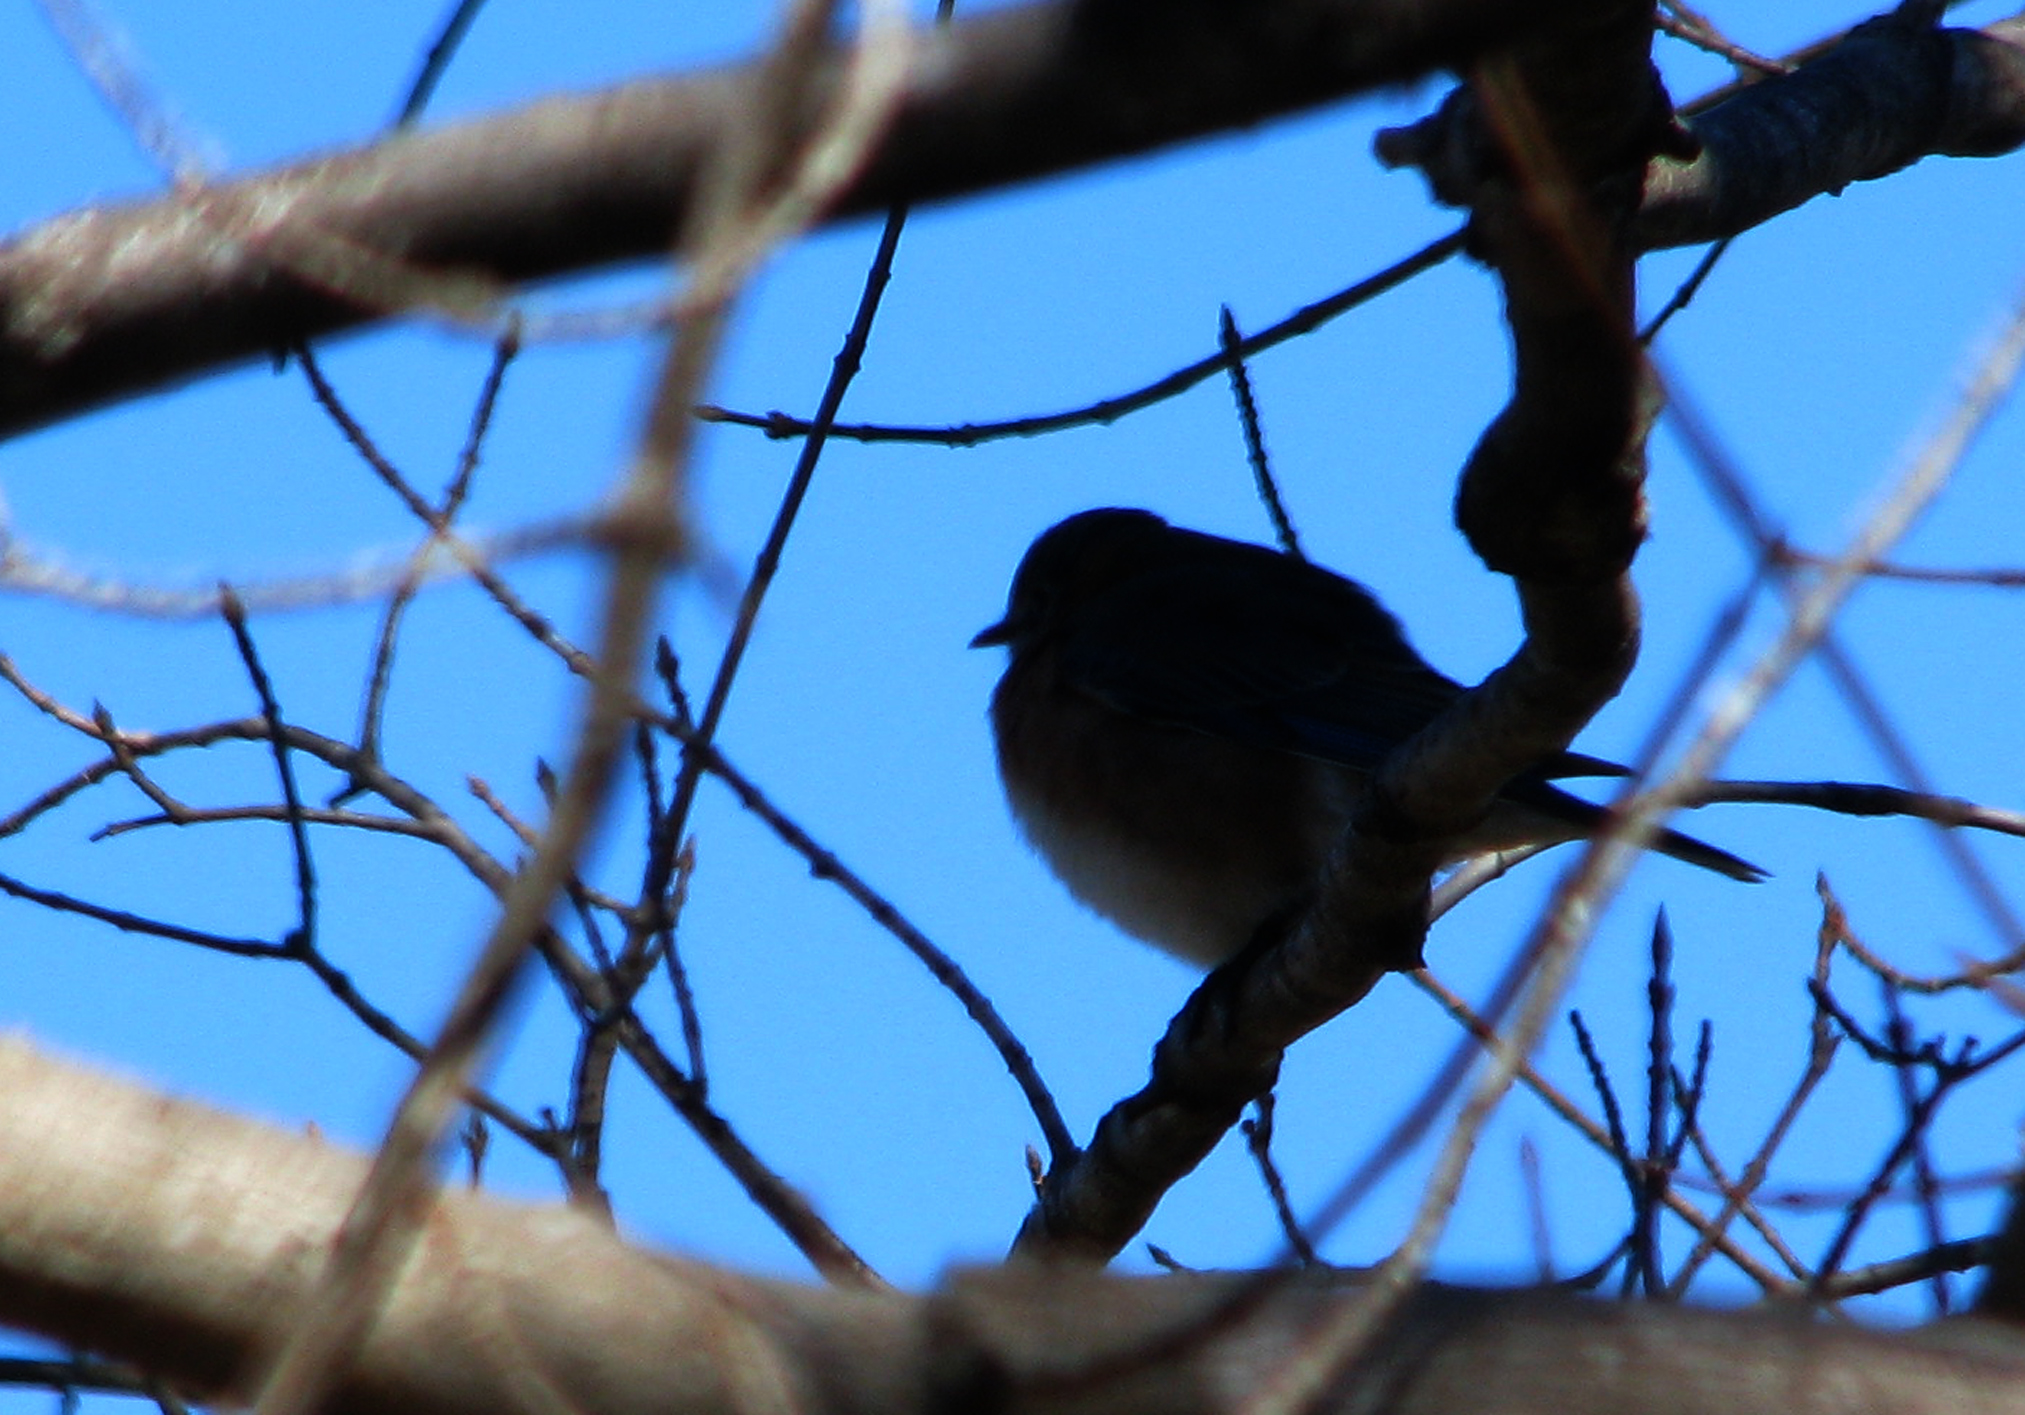 Bluebird silhouette